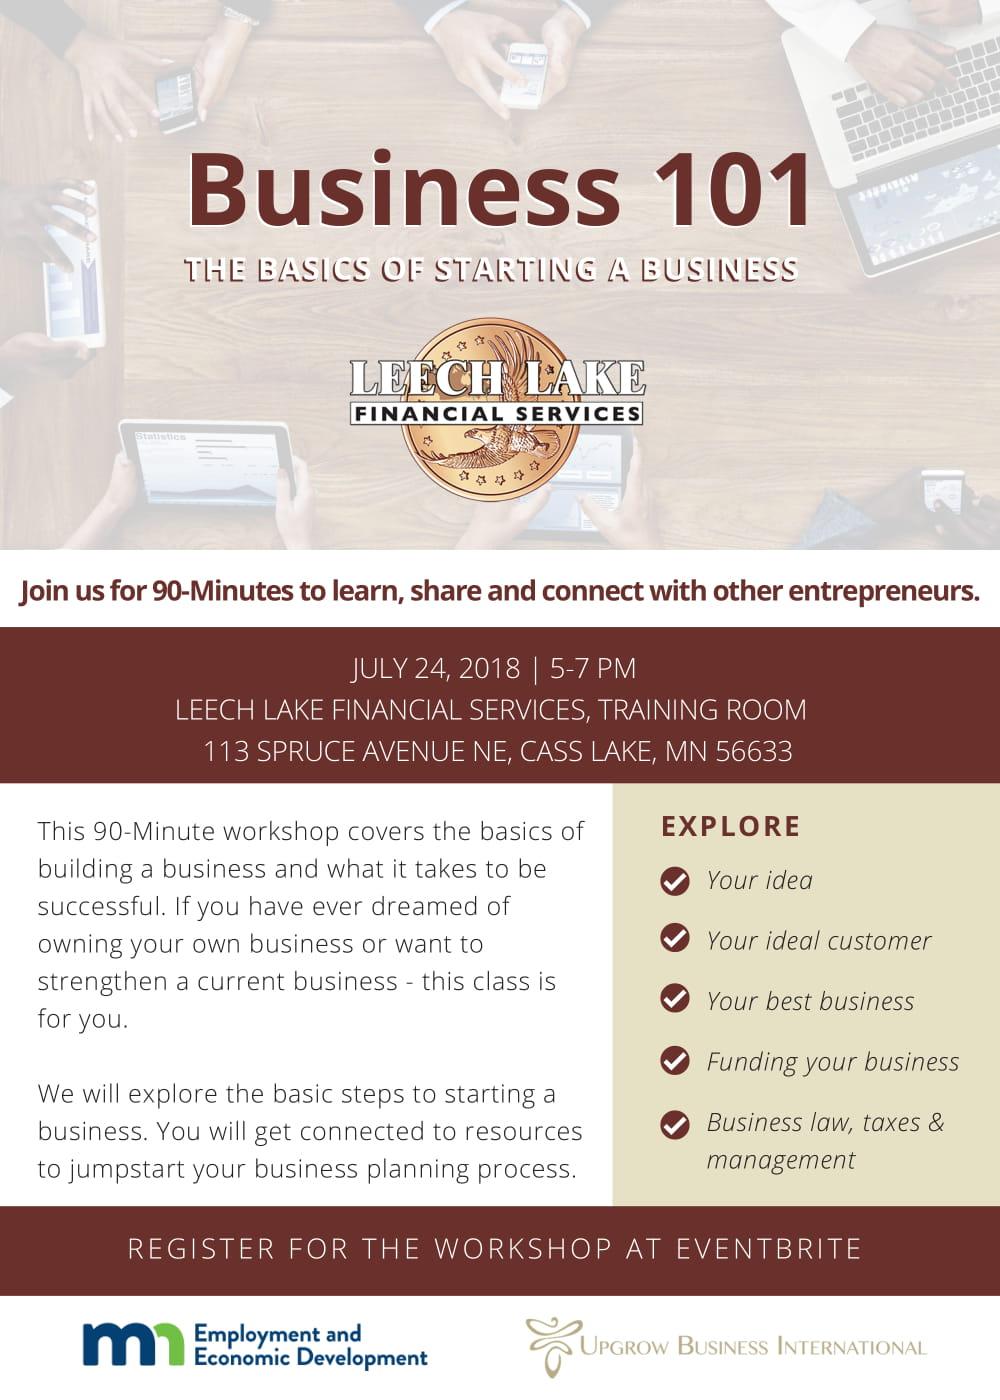 Business 101 Workshop Leech Lake News